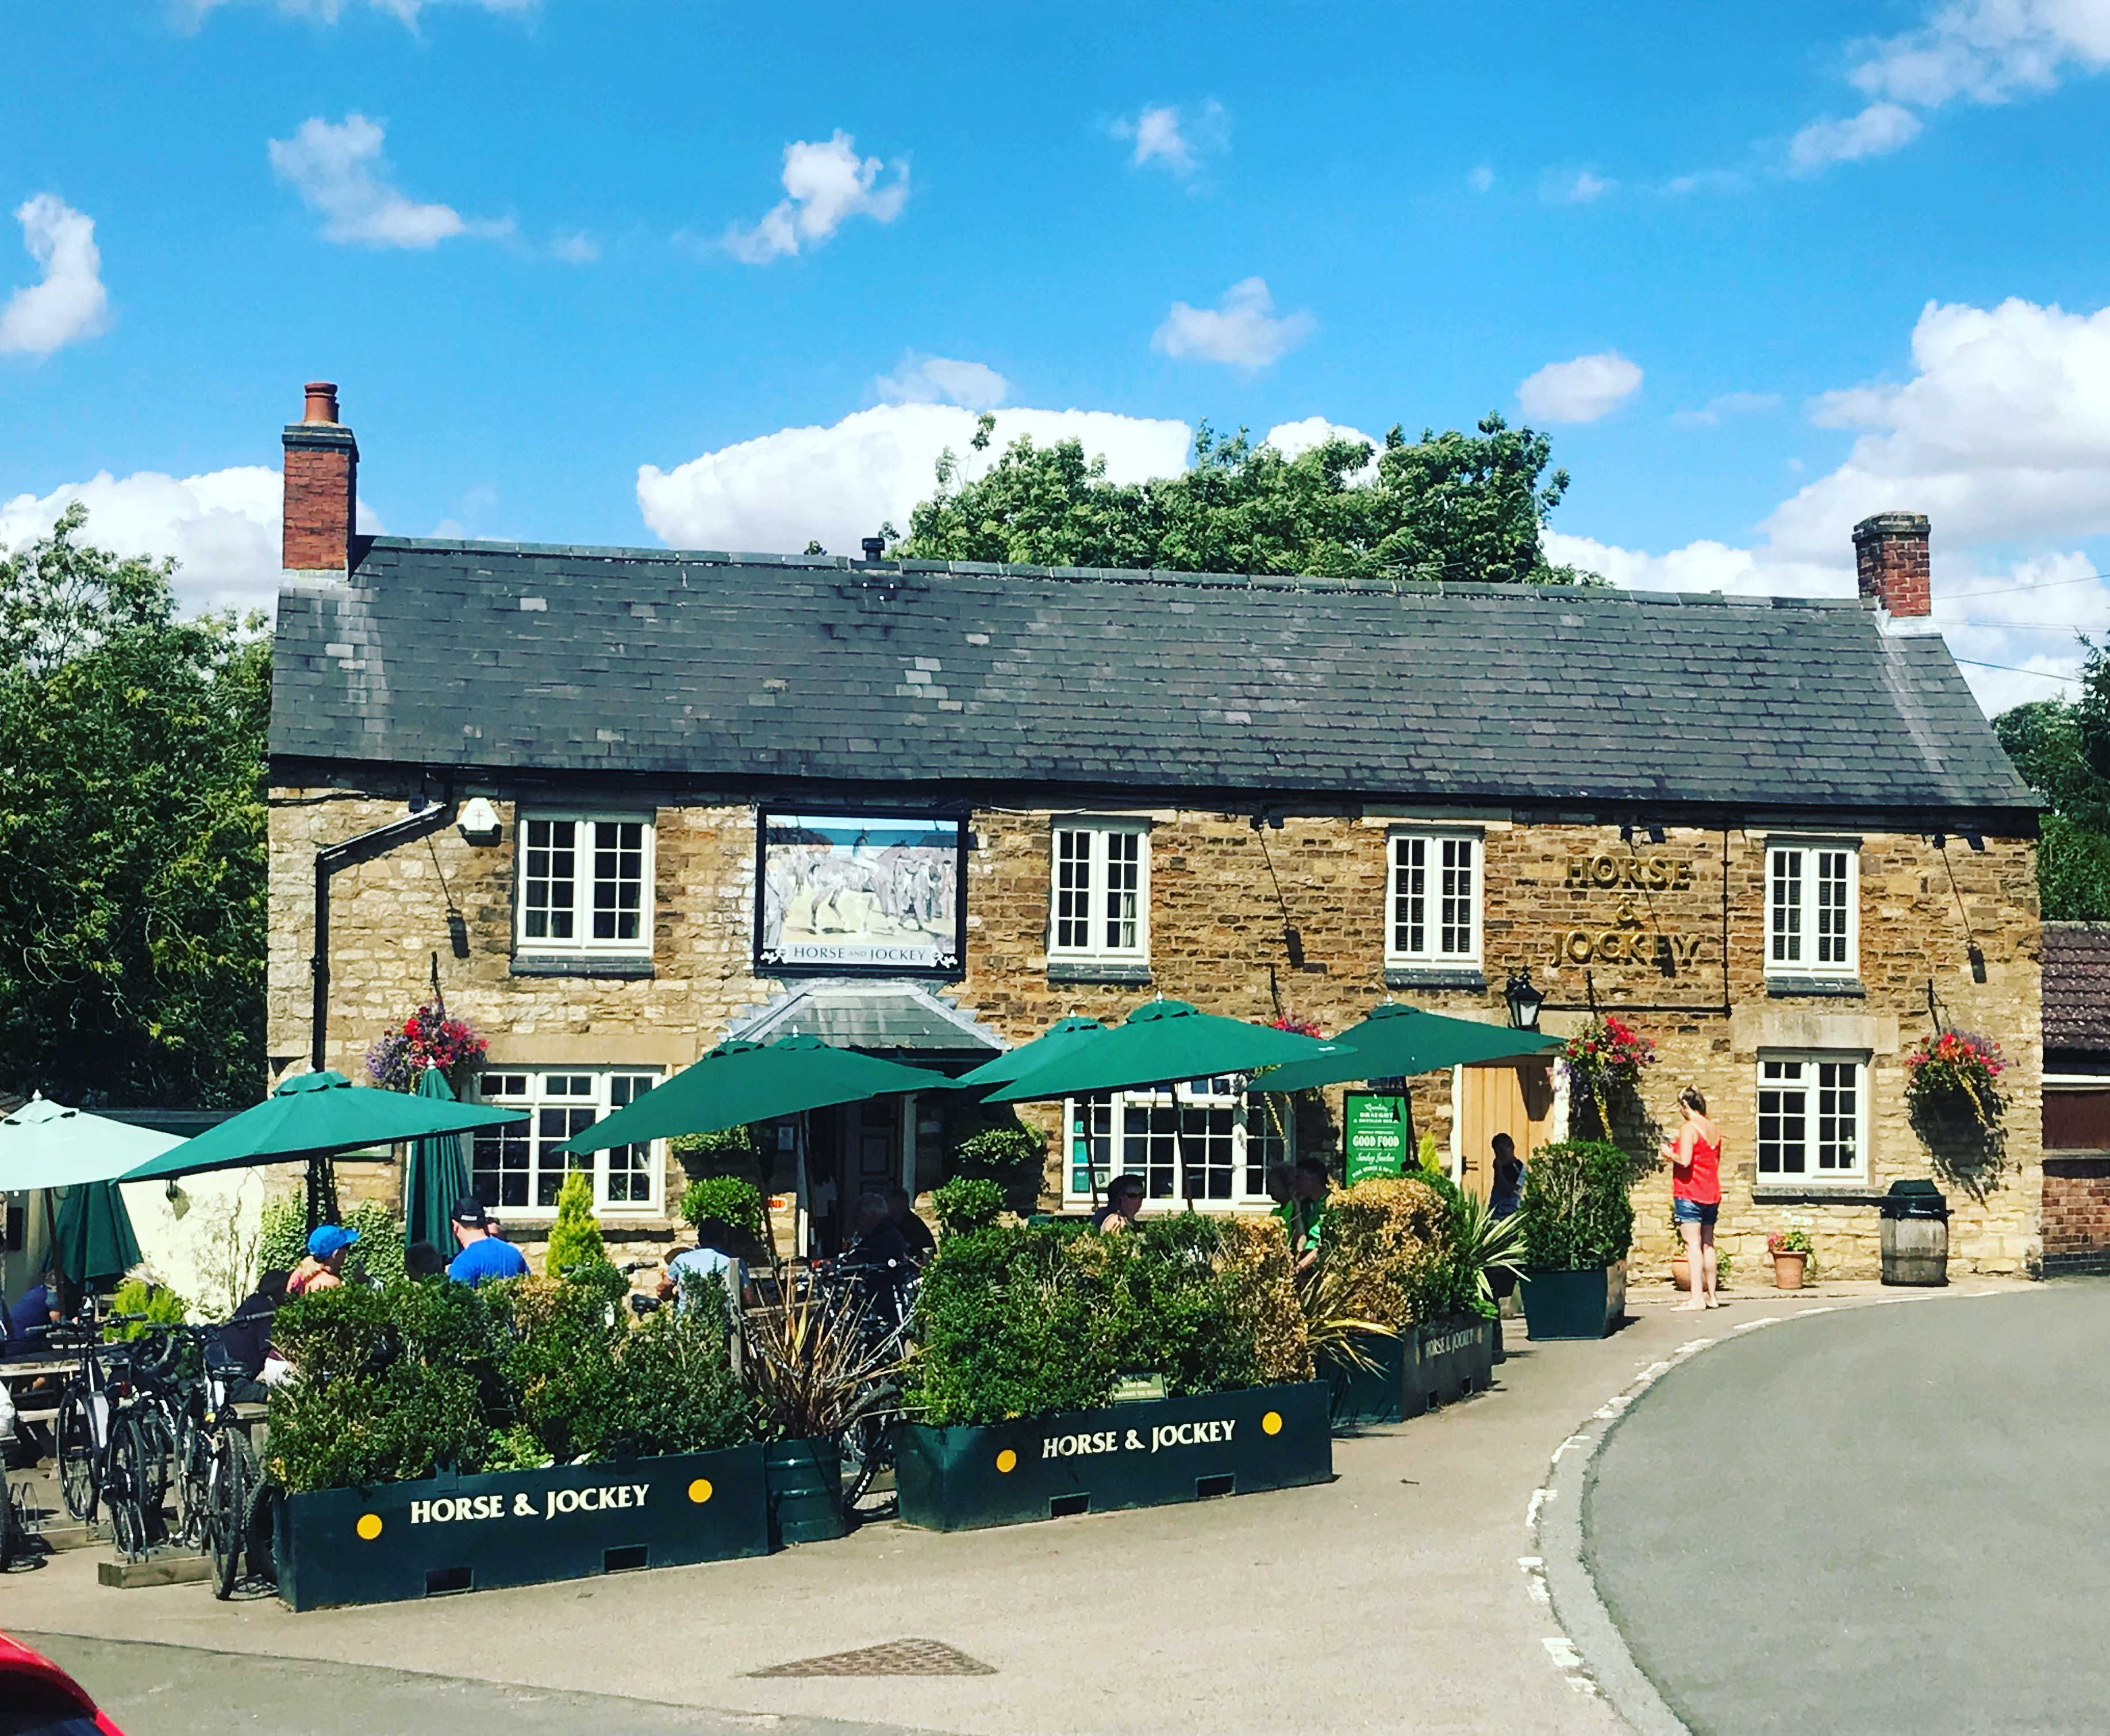 Horse & Jockey, Manton, Rutland